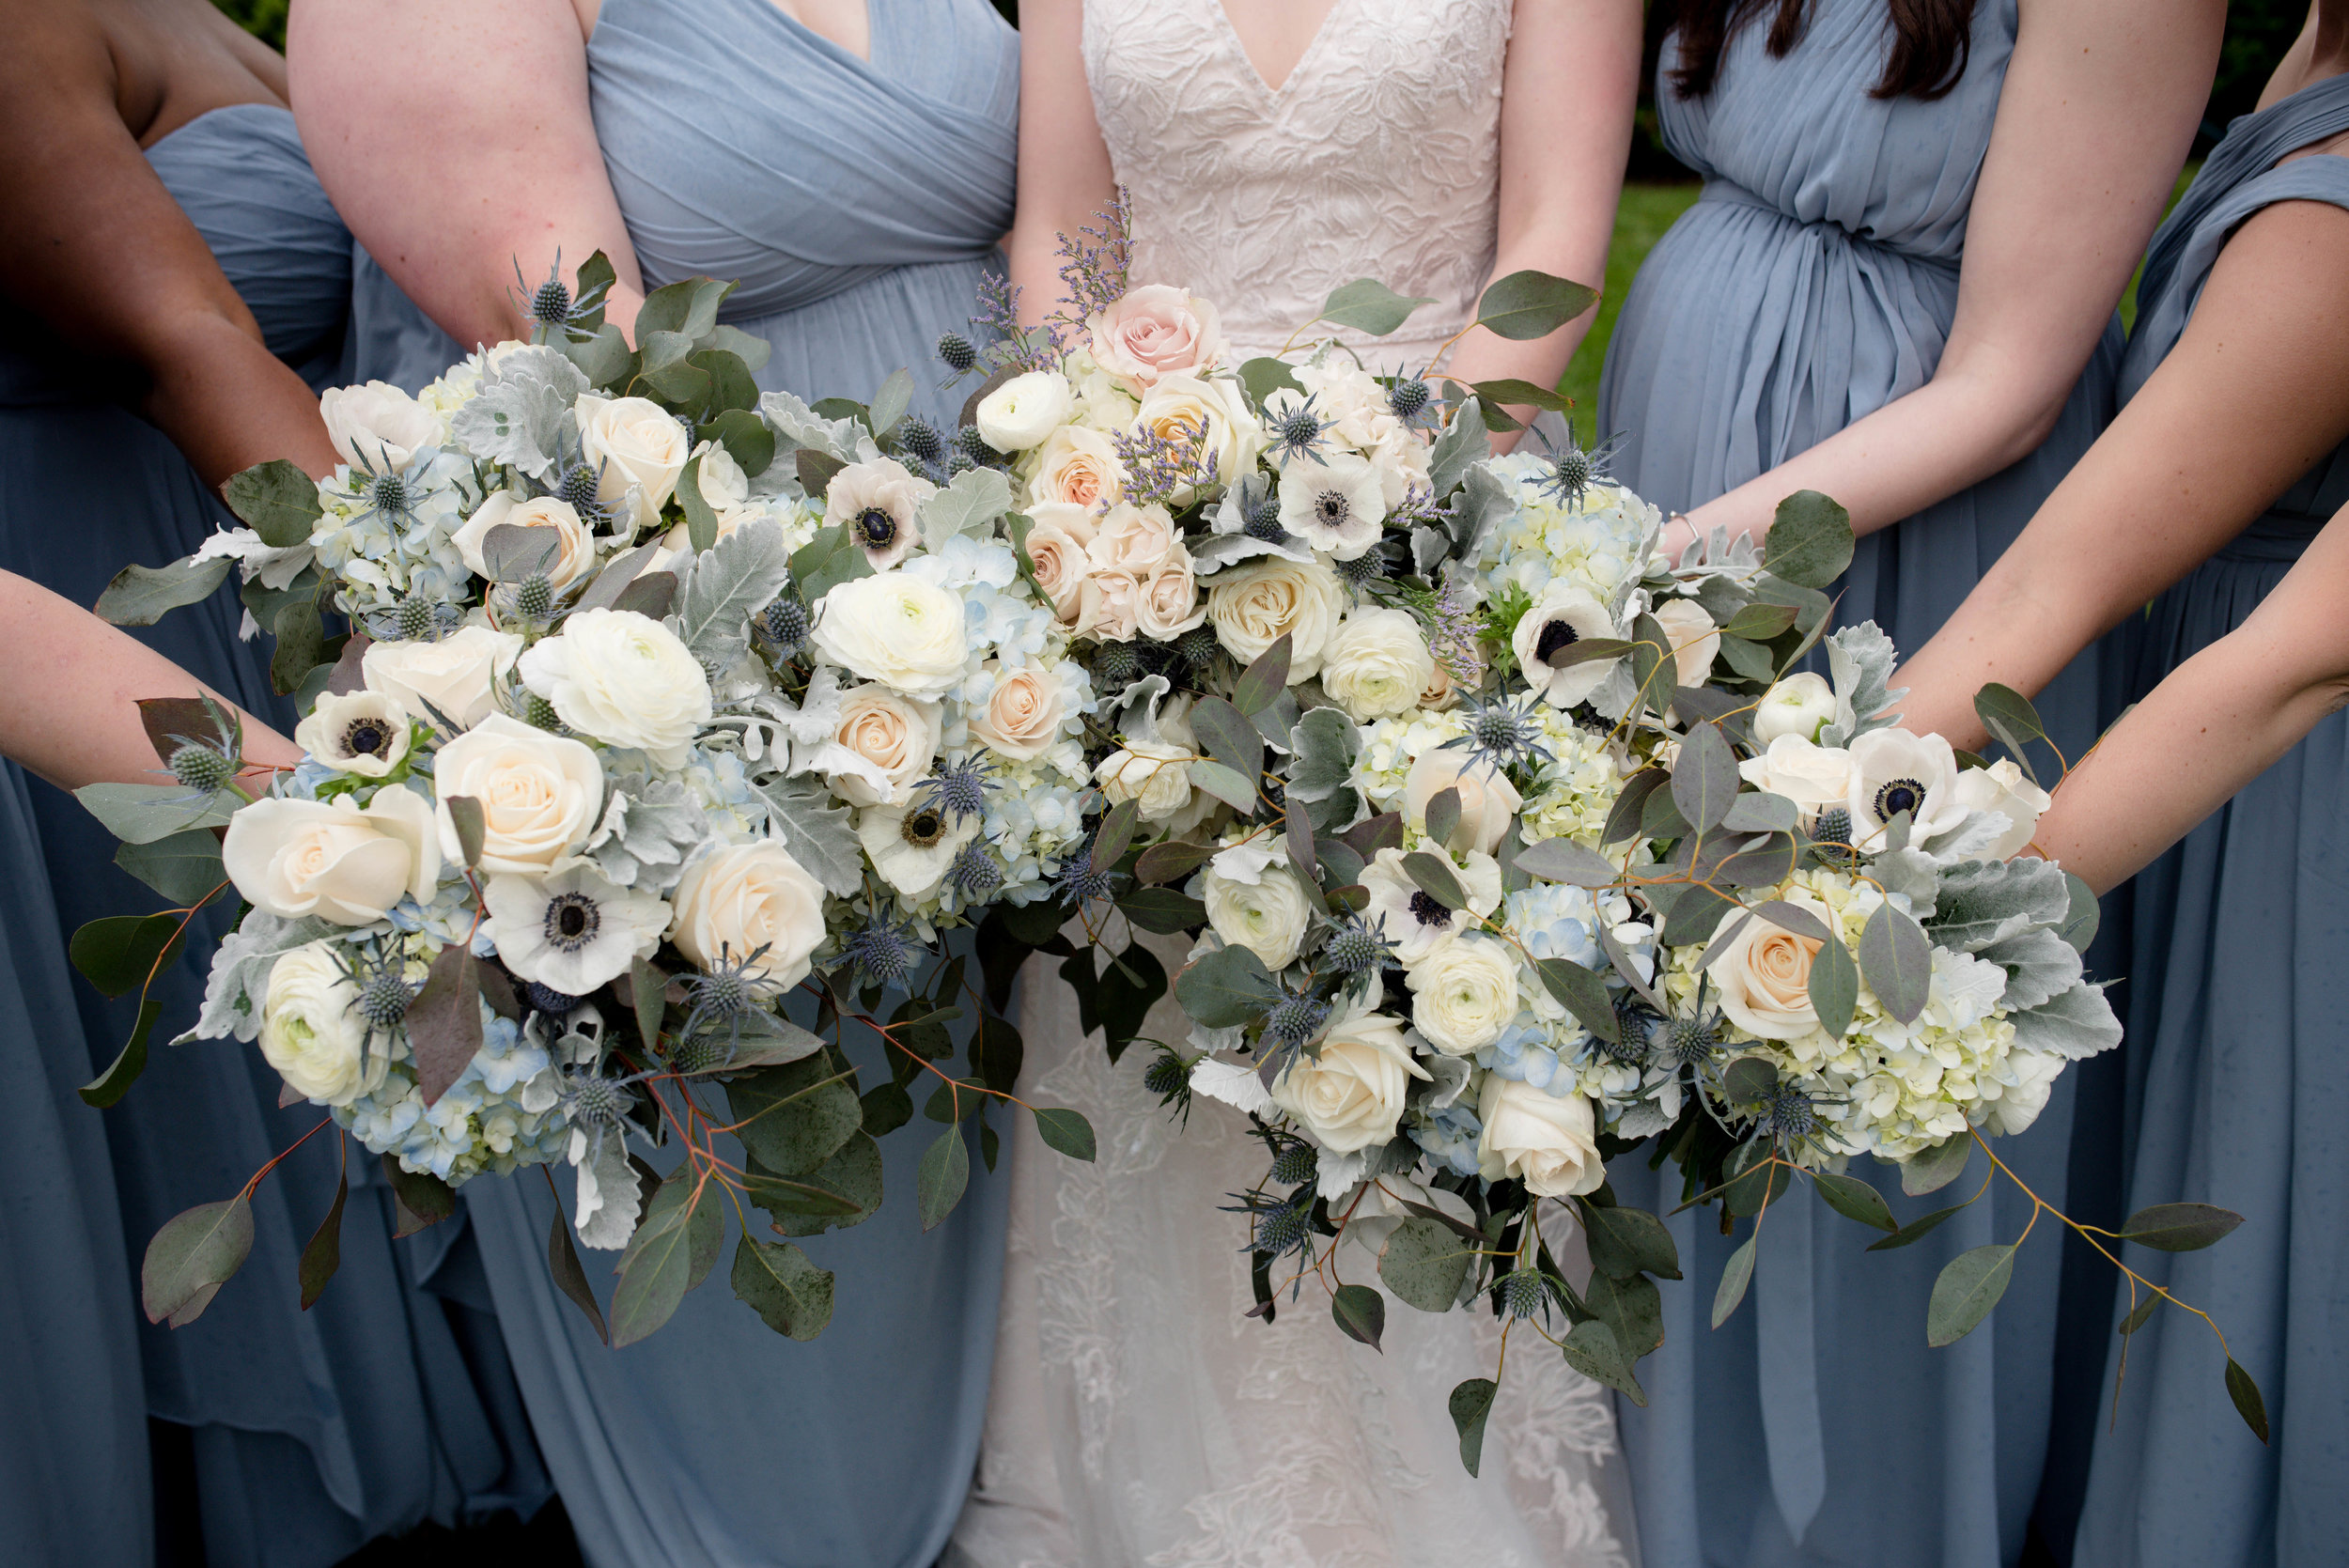 blue-ridge-wedding-ashley-nicole-photography-restoration-hall-crozetphotography-restorationhall-charlottesville-wedding_BPbridesmaids-2.jpg